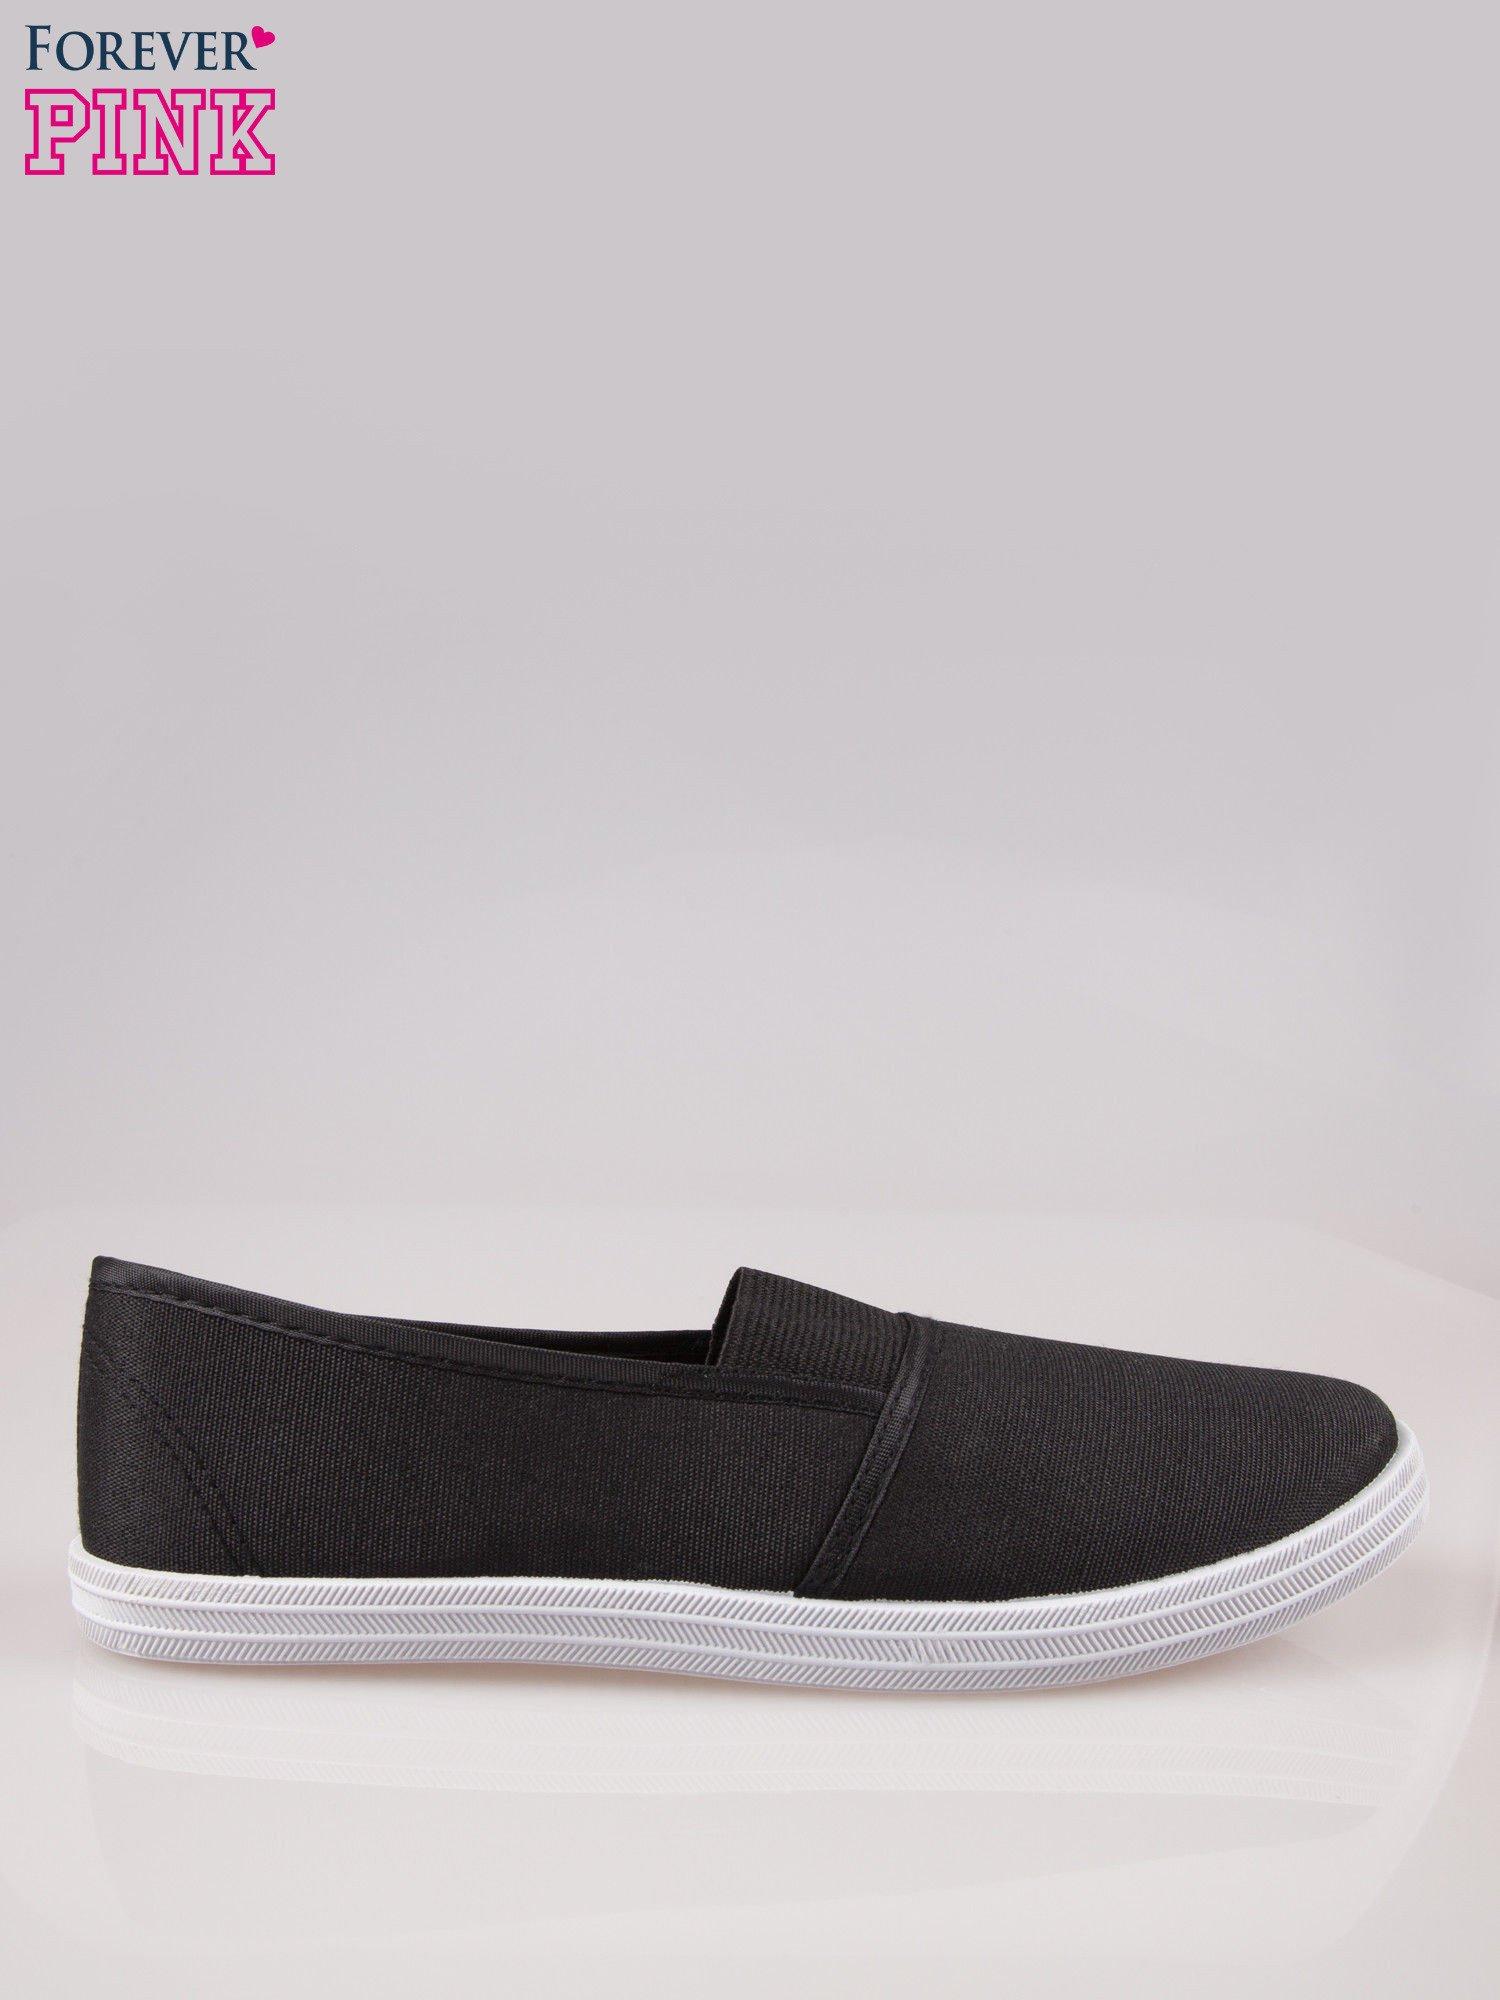 Czarne miękkie buty slip on                                  zdj.                                  1